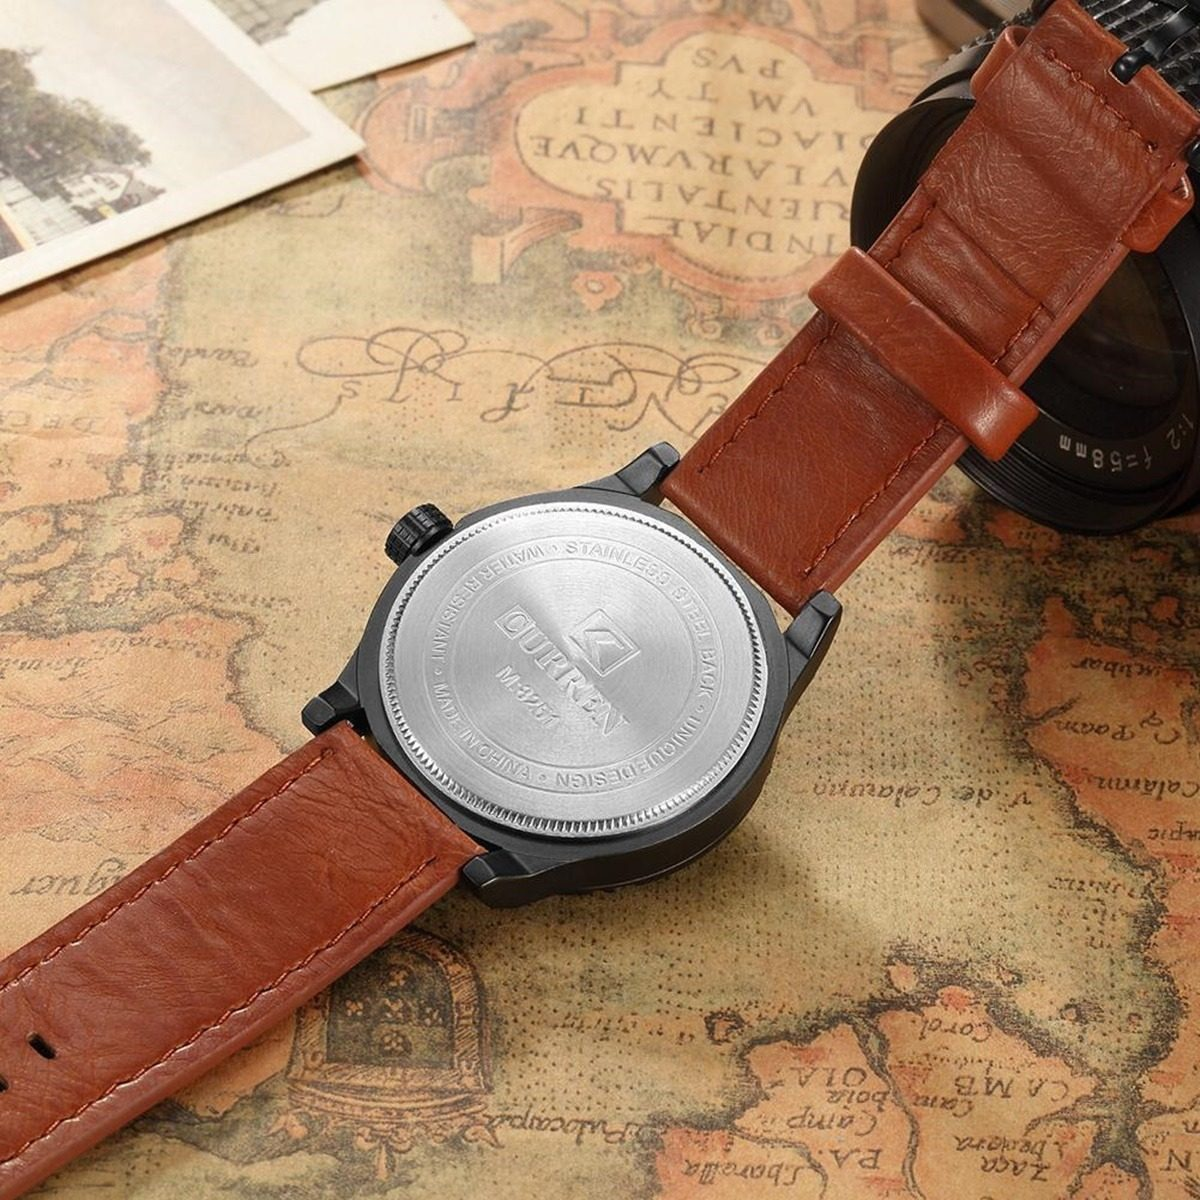 10e6bfeee7ddd Relógio Masculino Curren 8251 Preto marrom Nf+brinde - R  135,00 em ...